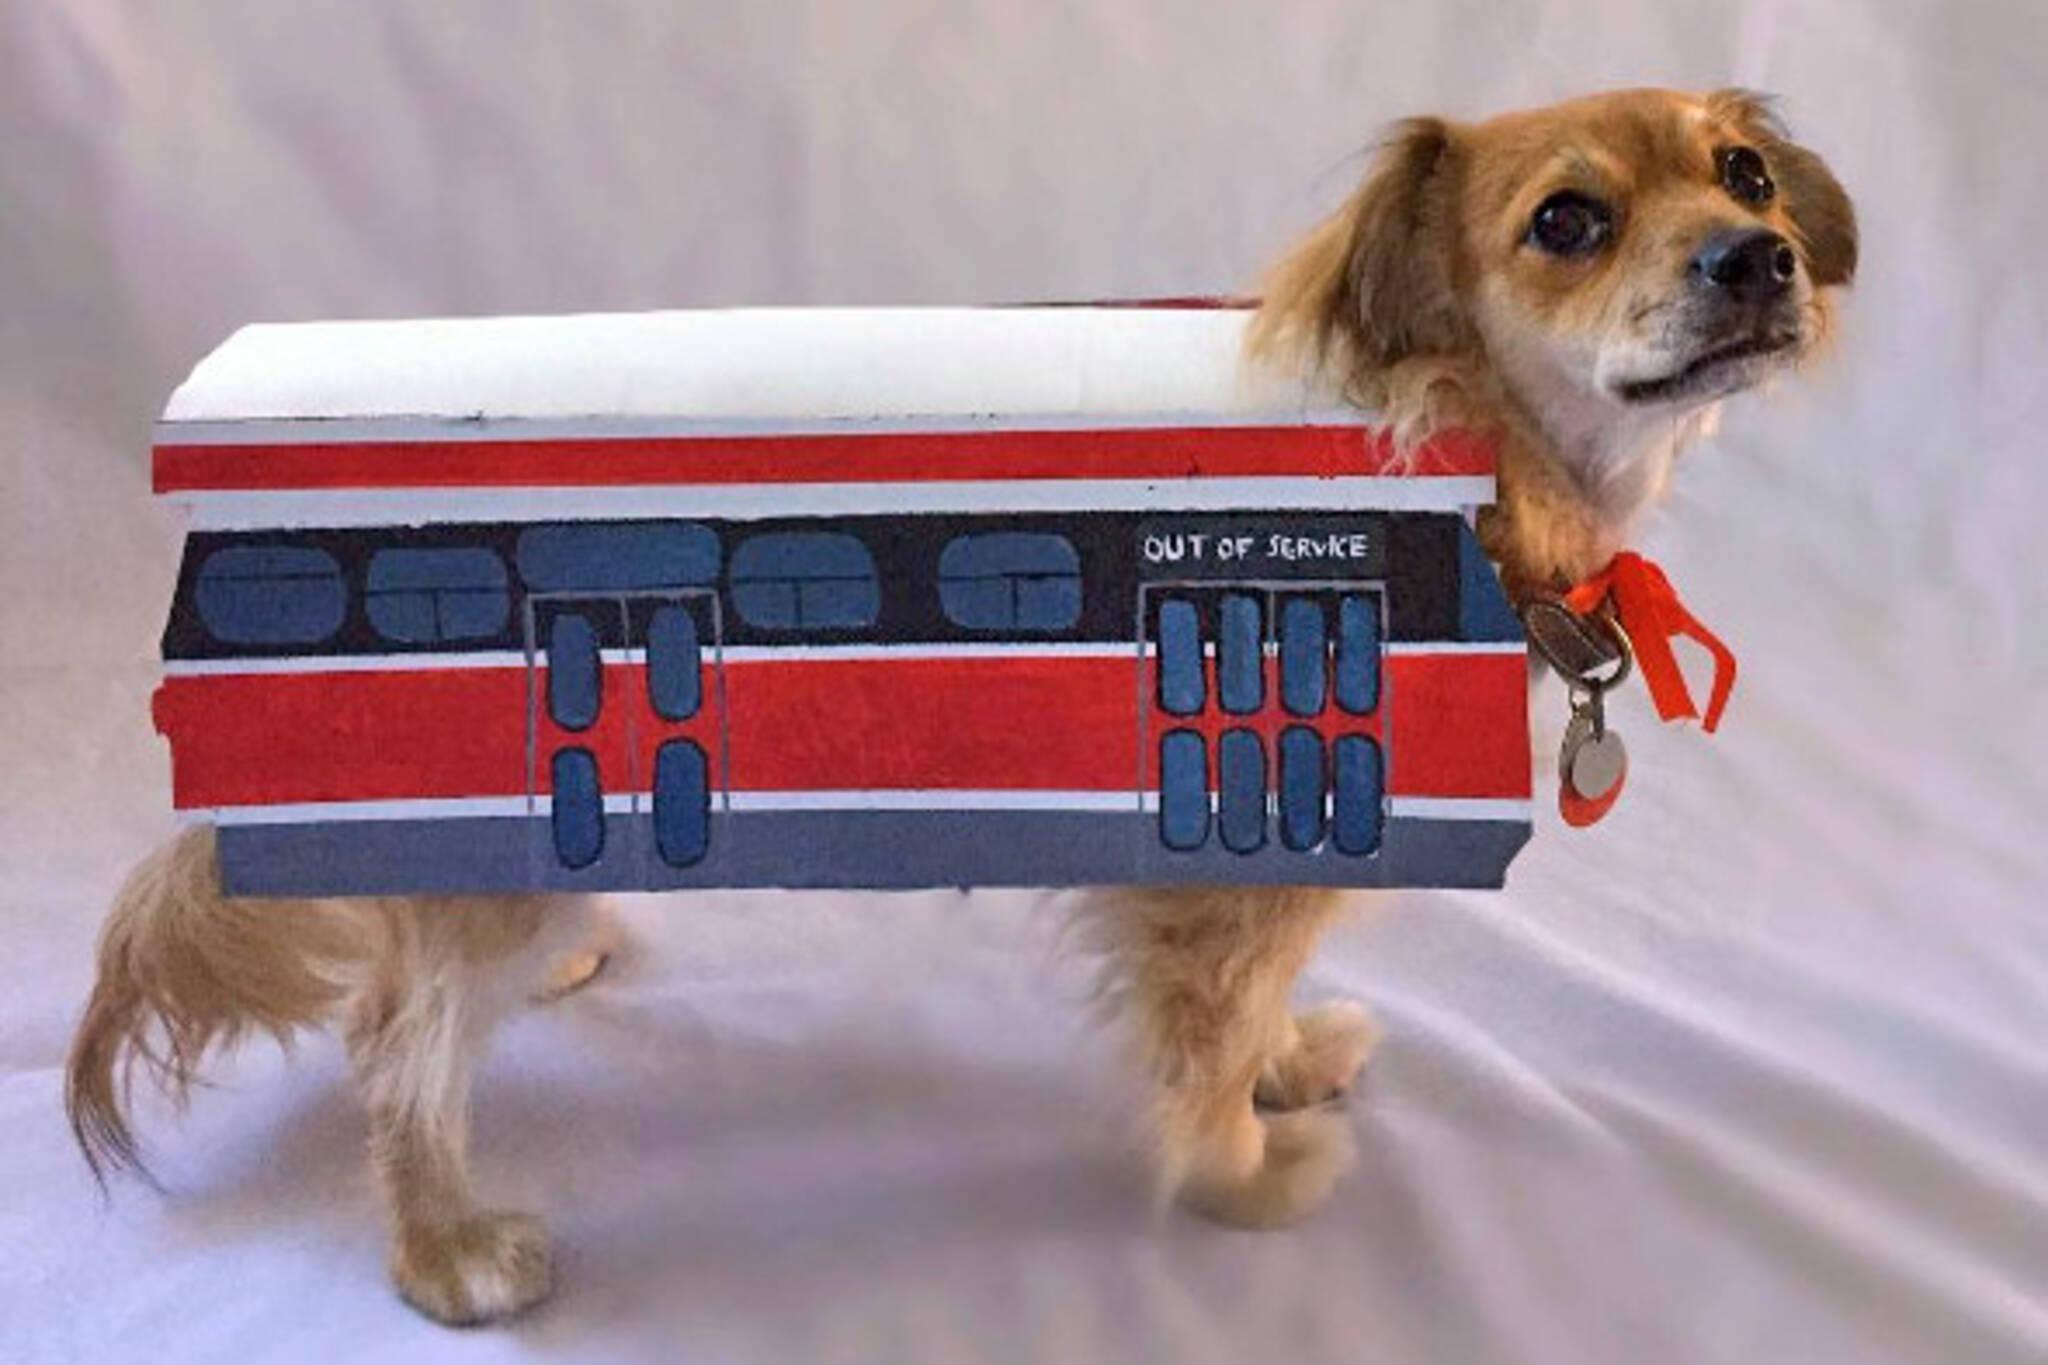 ttc streetcar dog